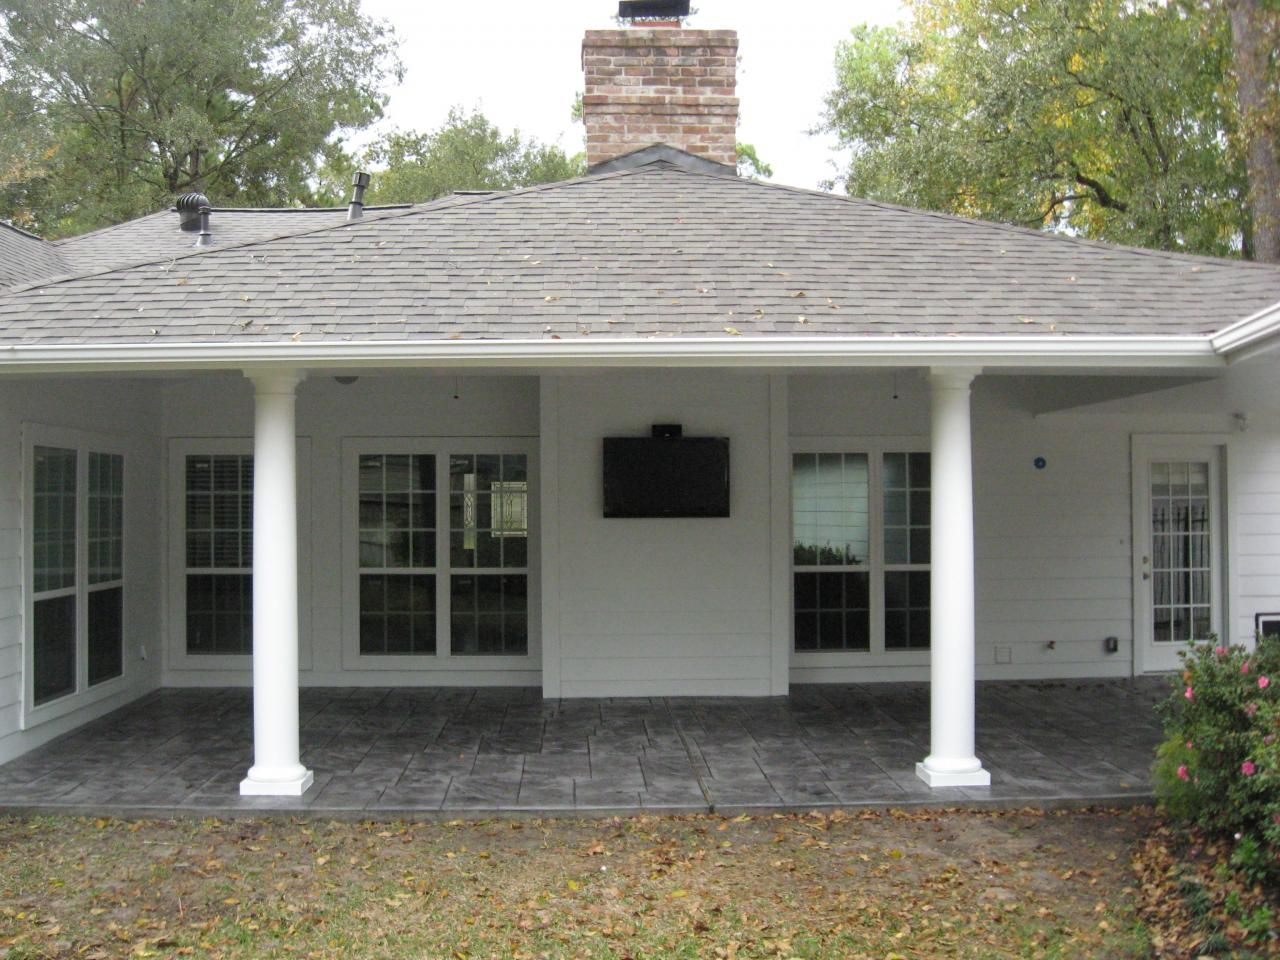 Stamped Concrete Patio Houston | Patio Cover / Stamped Concrete